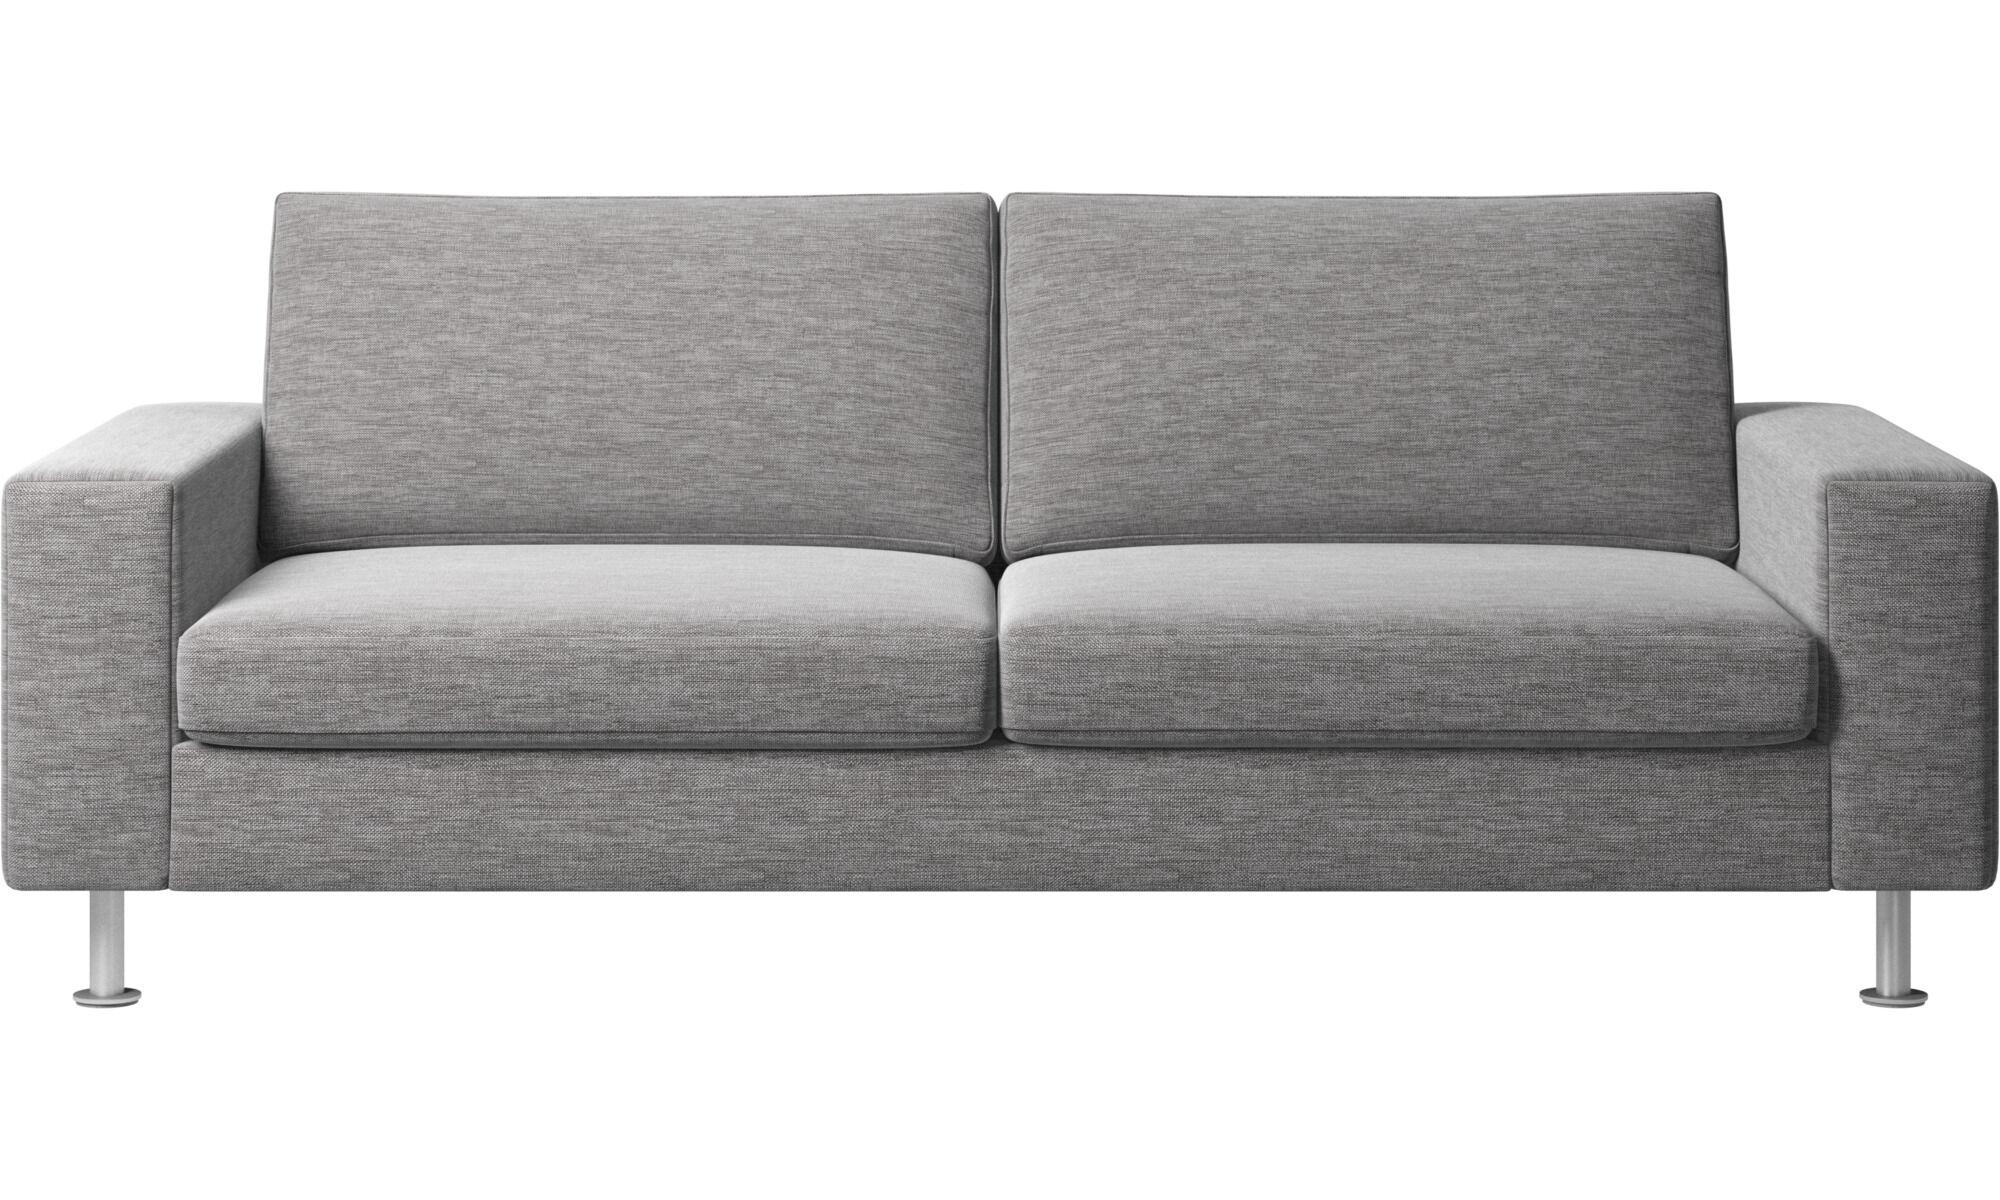 Furniture Convertible Sofa Bed Single Sleeper Folding Lounge